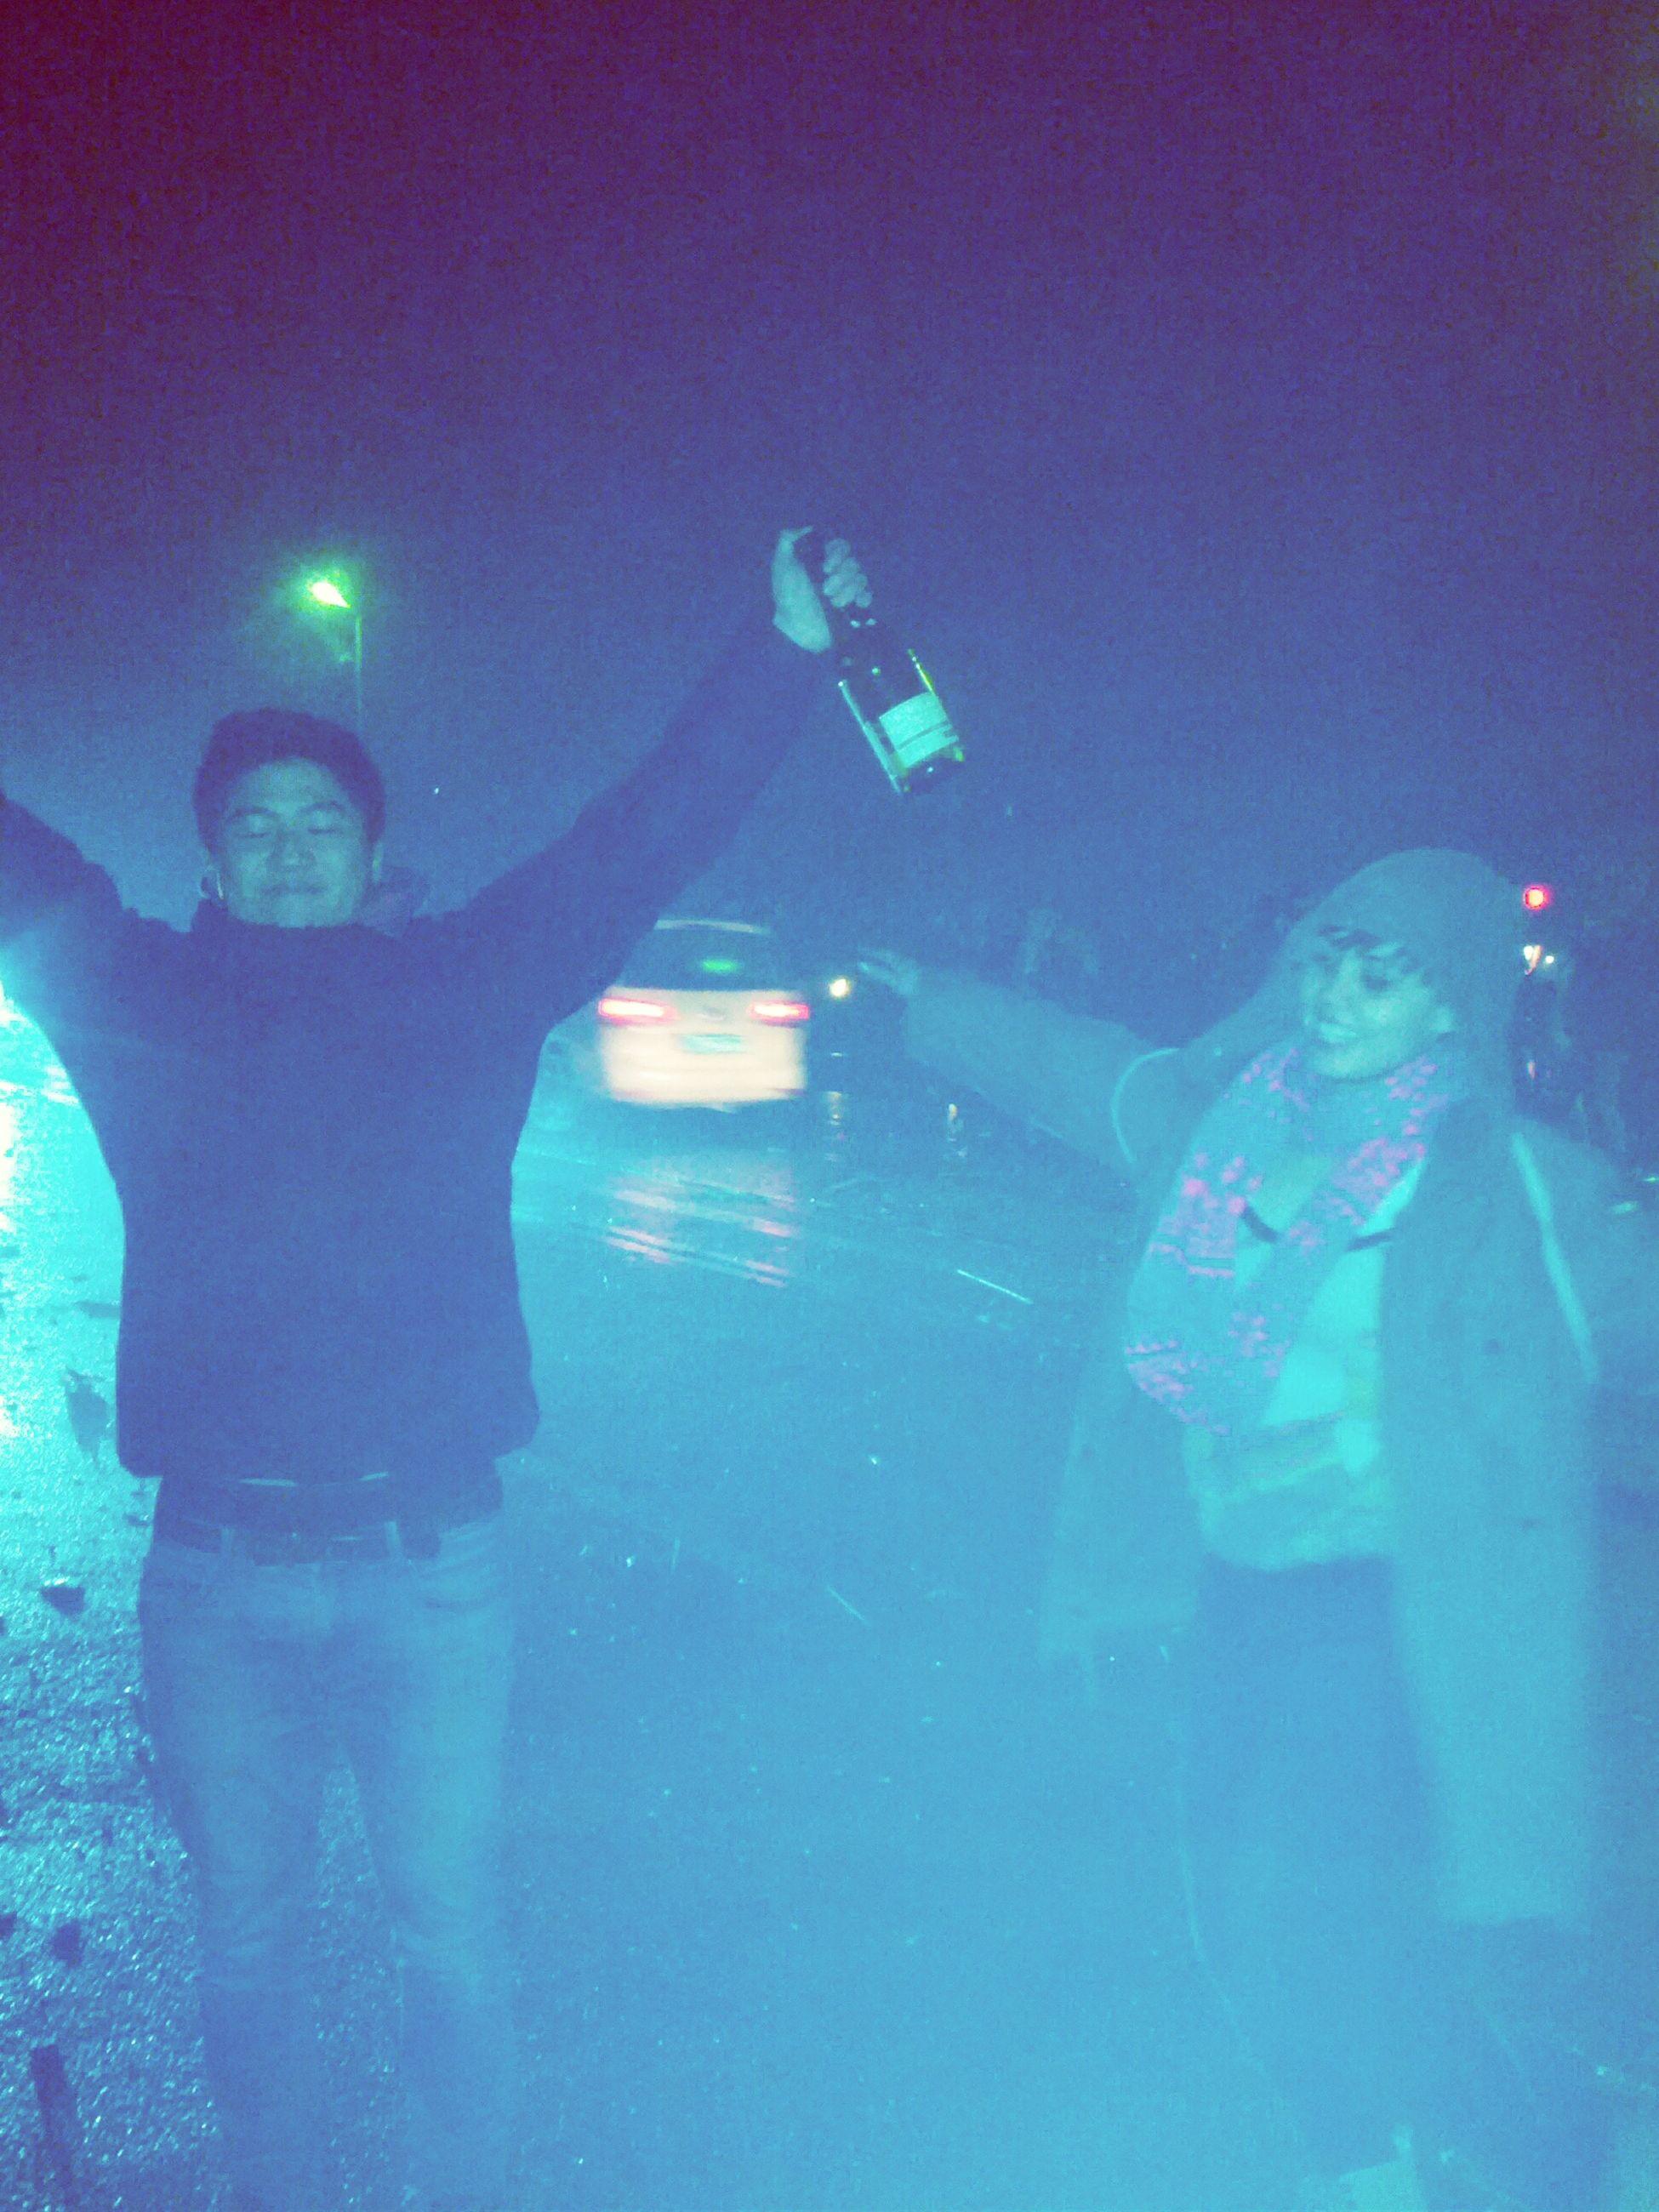 blue, illuminated, underwater, leisure activity, lifestyles, men, swimming, water, night, unrecognizable person, indoors, undersea, full length, adventure, transportation, lighting equipment, exploration, transparent